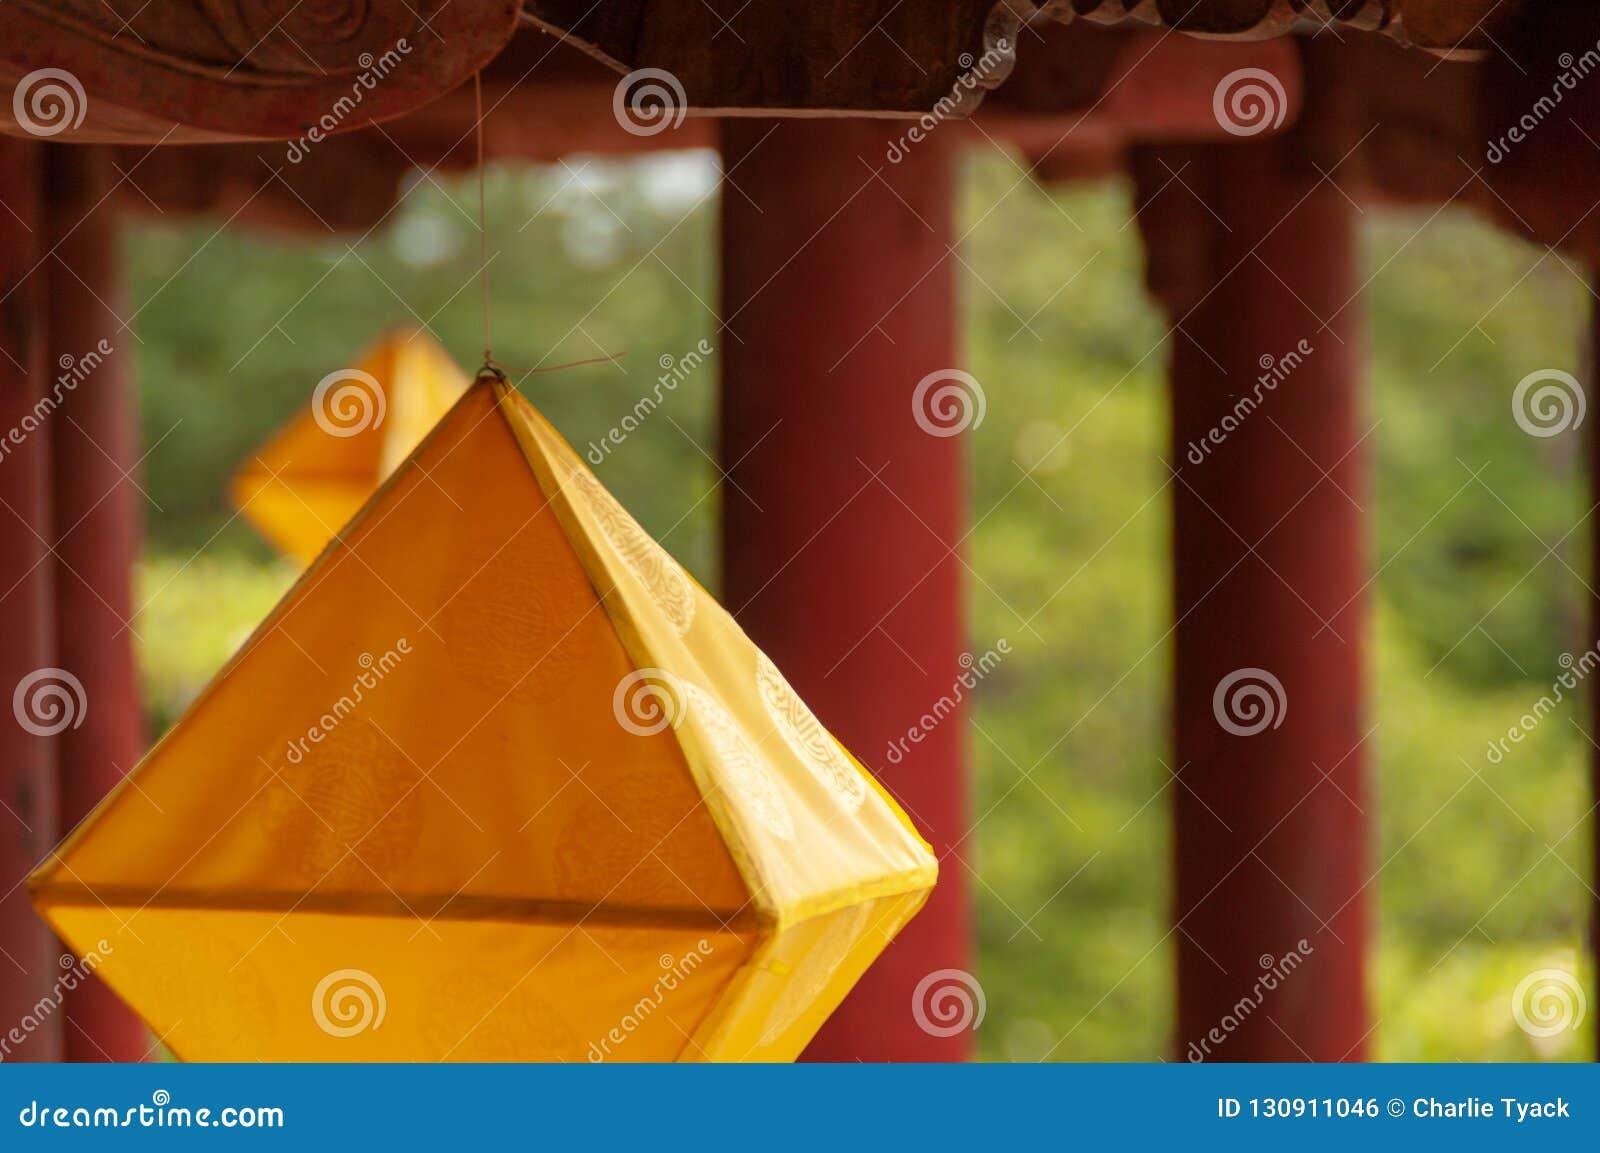 Diamond-shaped lanterns in the Forbidden City, Hue, Vietnam